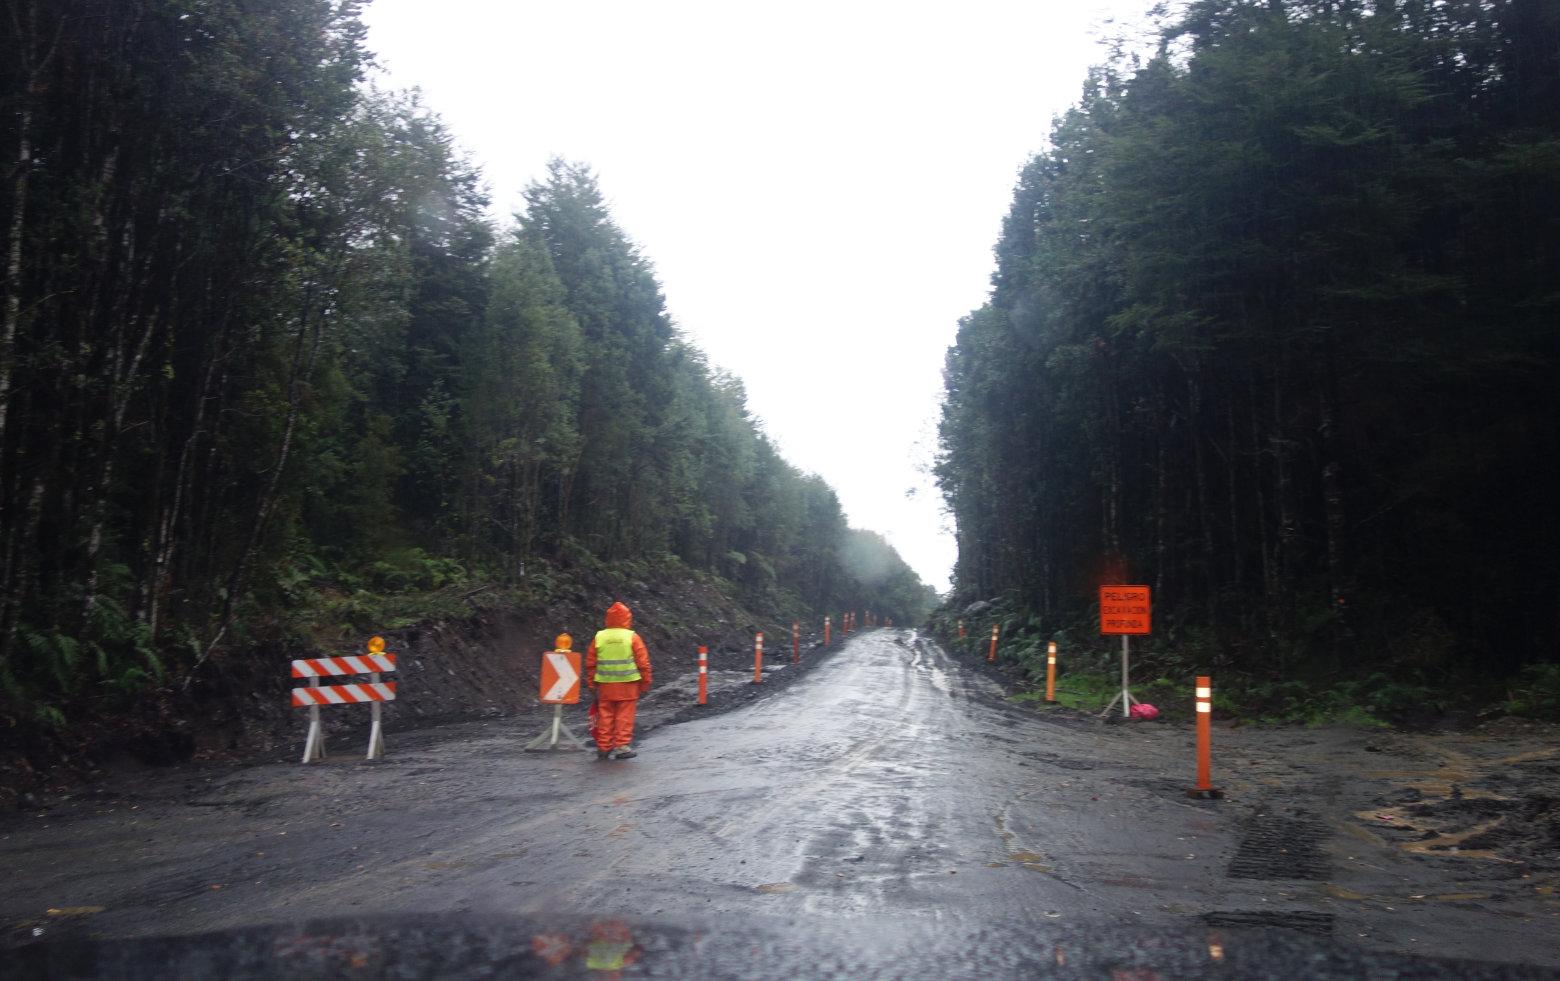 Chile Carretera Austral Regen